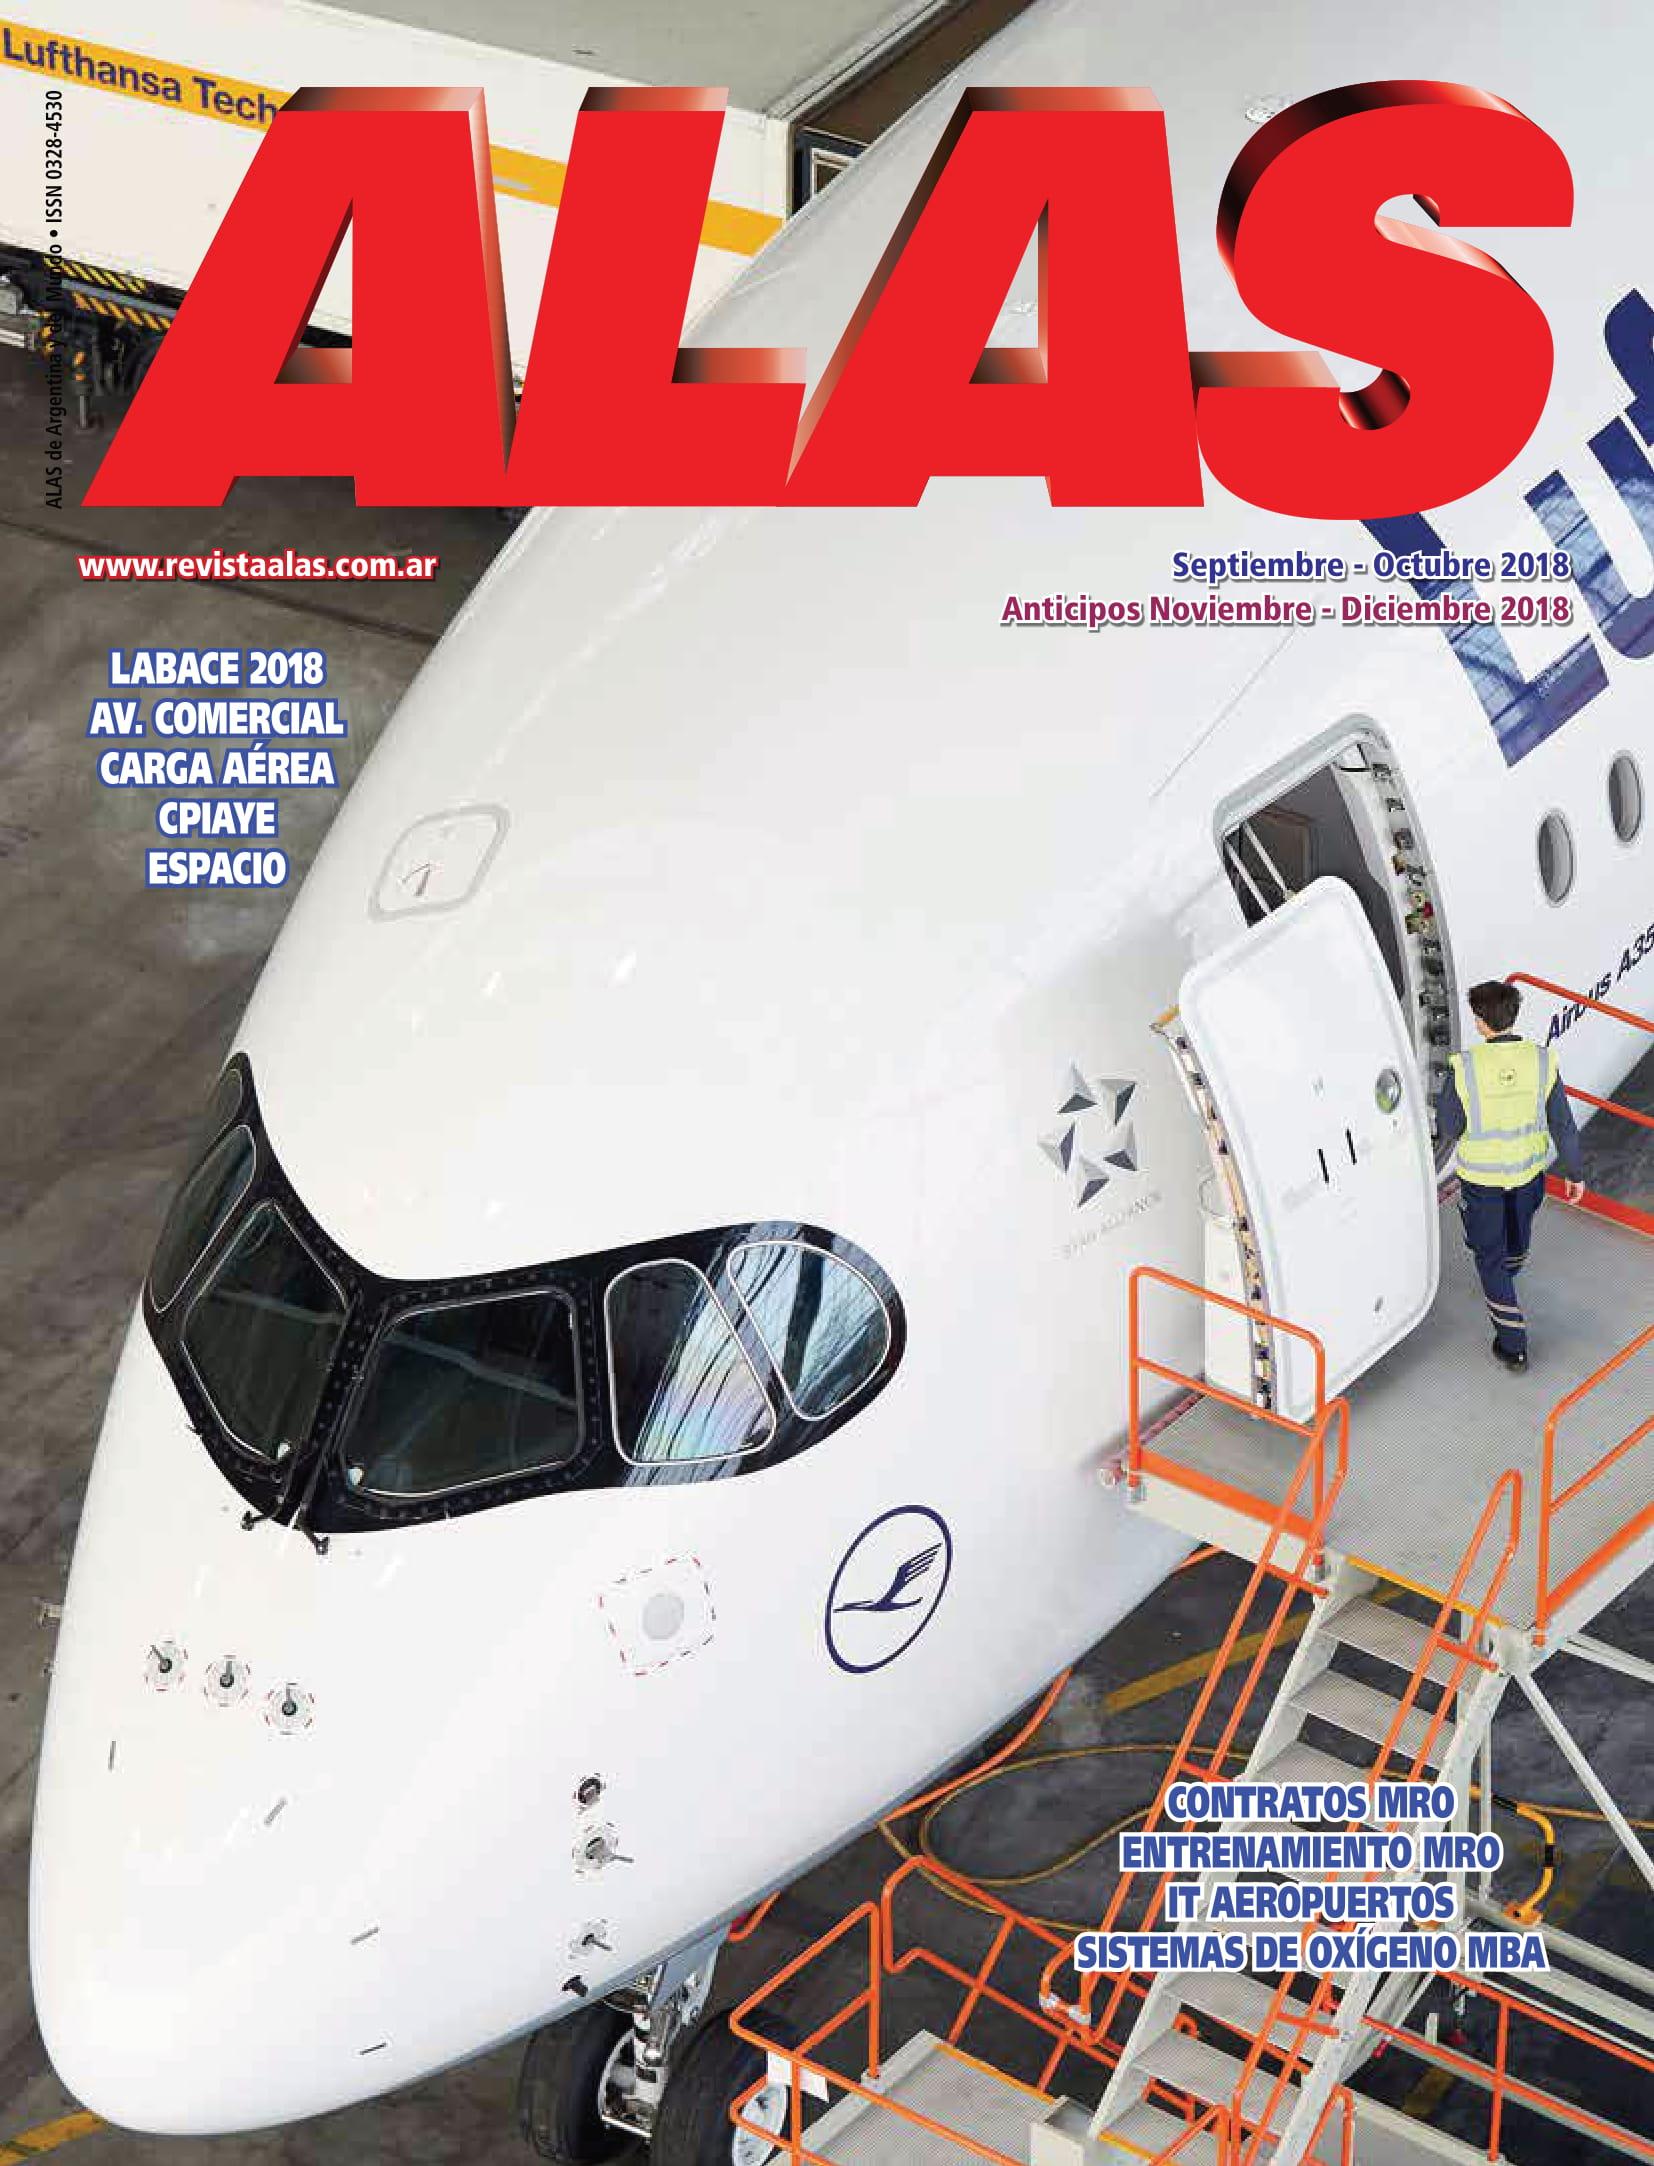 ALAS magazine (APROC 2018)-01